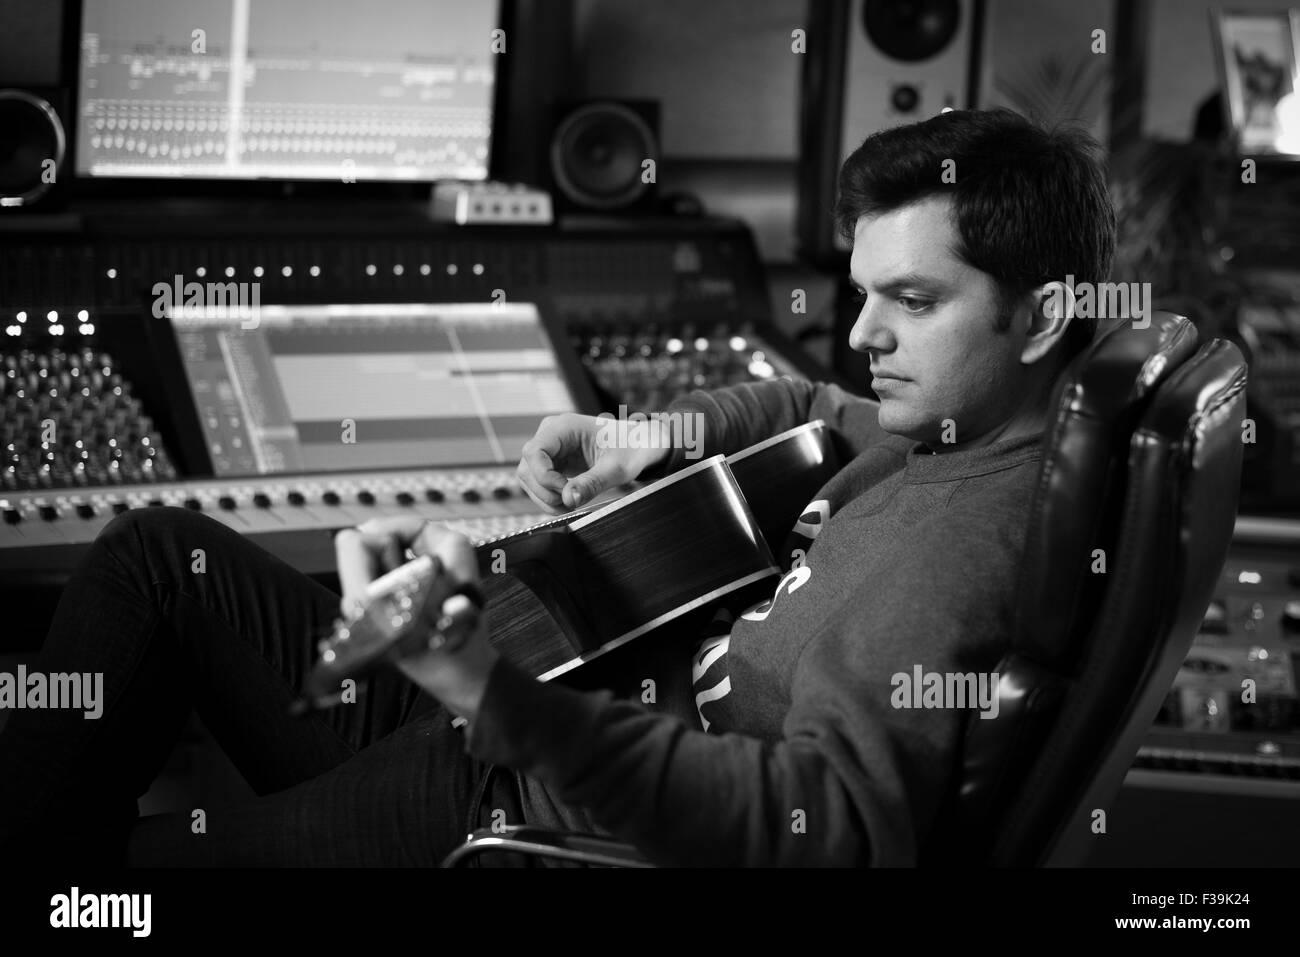 Man playing guitar in recording studio Stock Photo